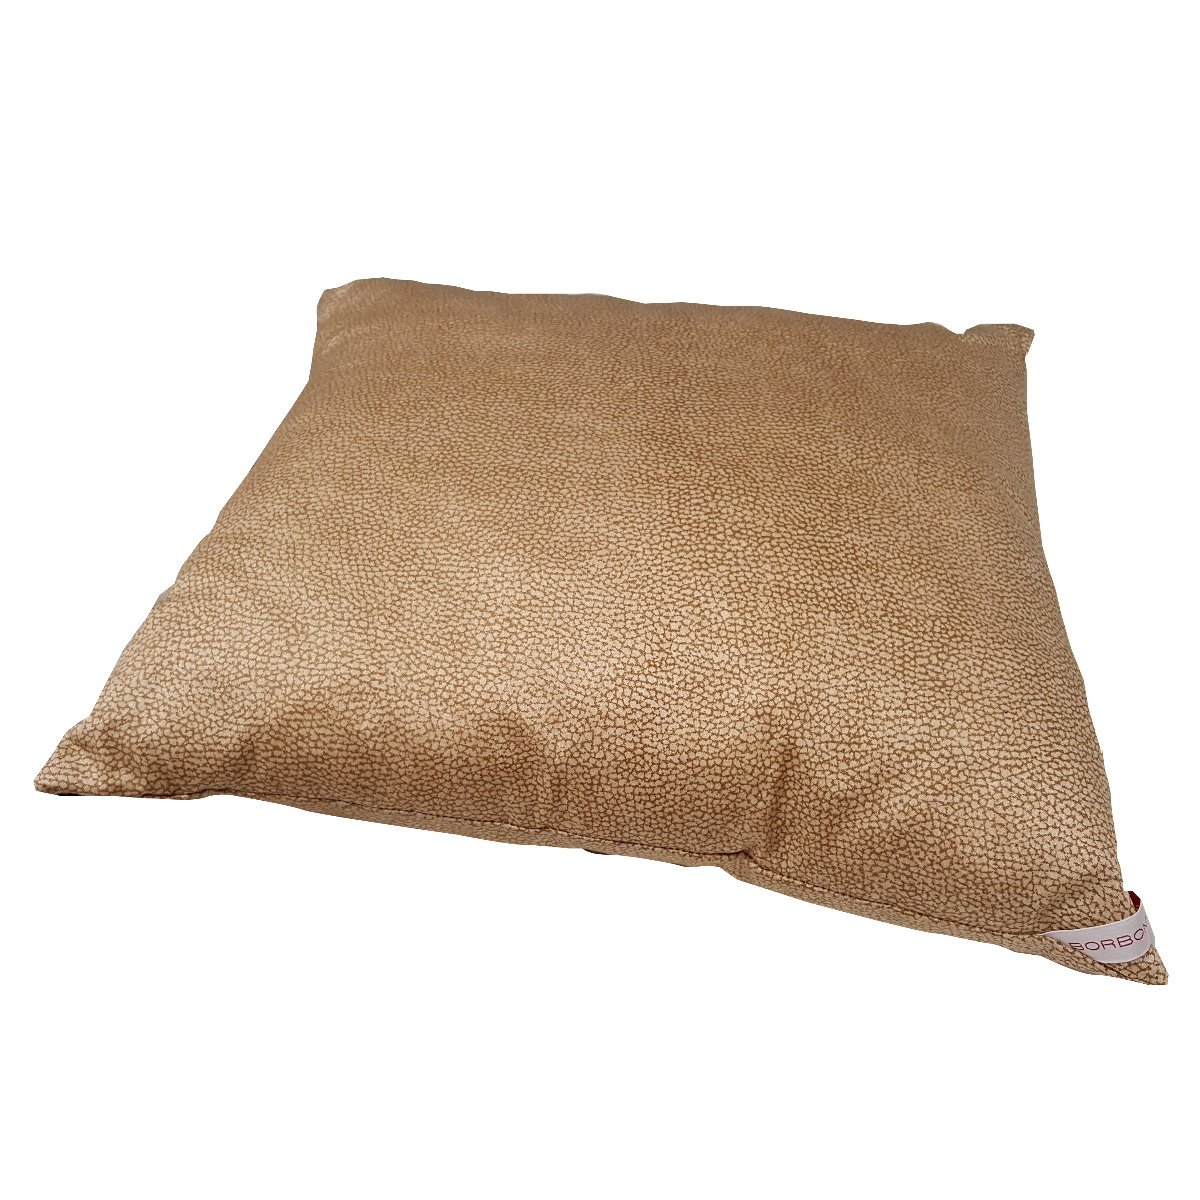 Vendita di cuscini per salotto di qualit in varie misure for Vendita cuscini arredo